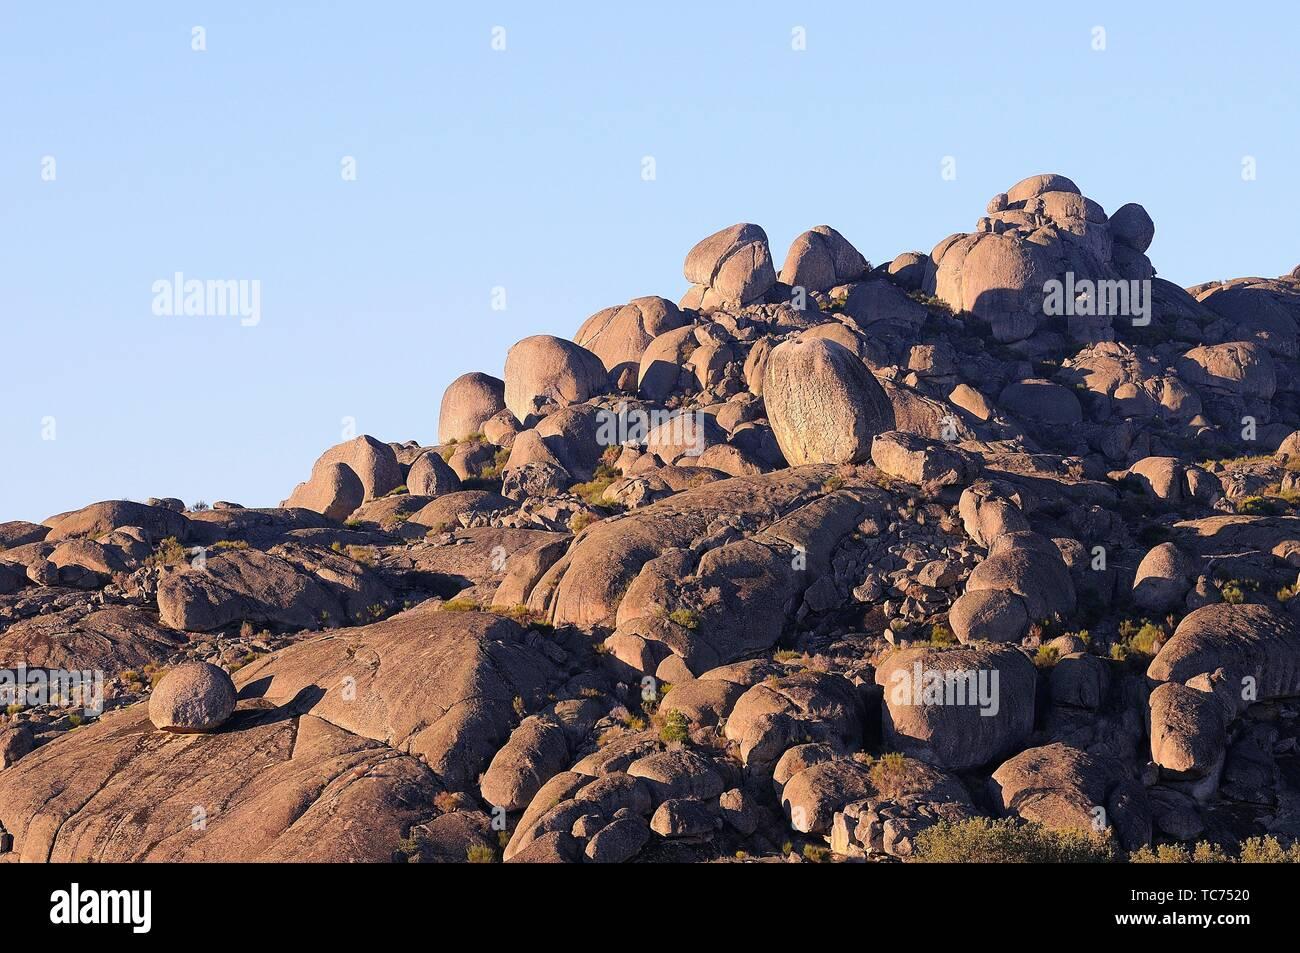 Granitic morphology. Valencia de Alcántara. Cáceres province. Extremadura. Spain Stock Photo